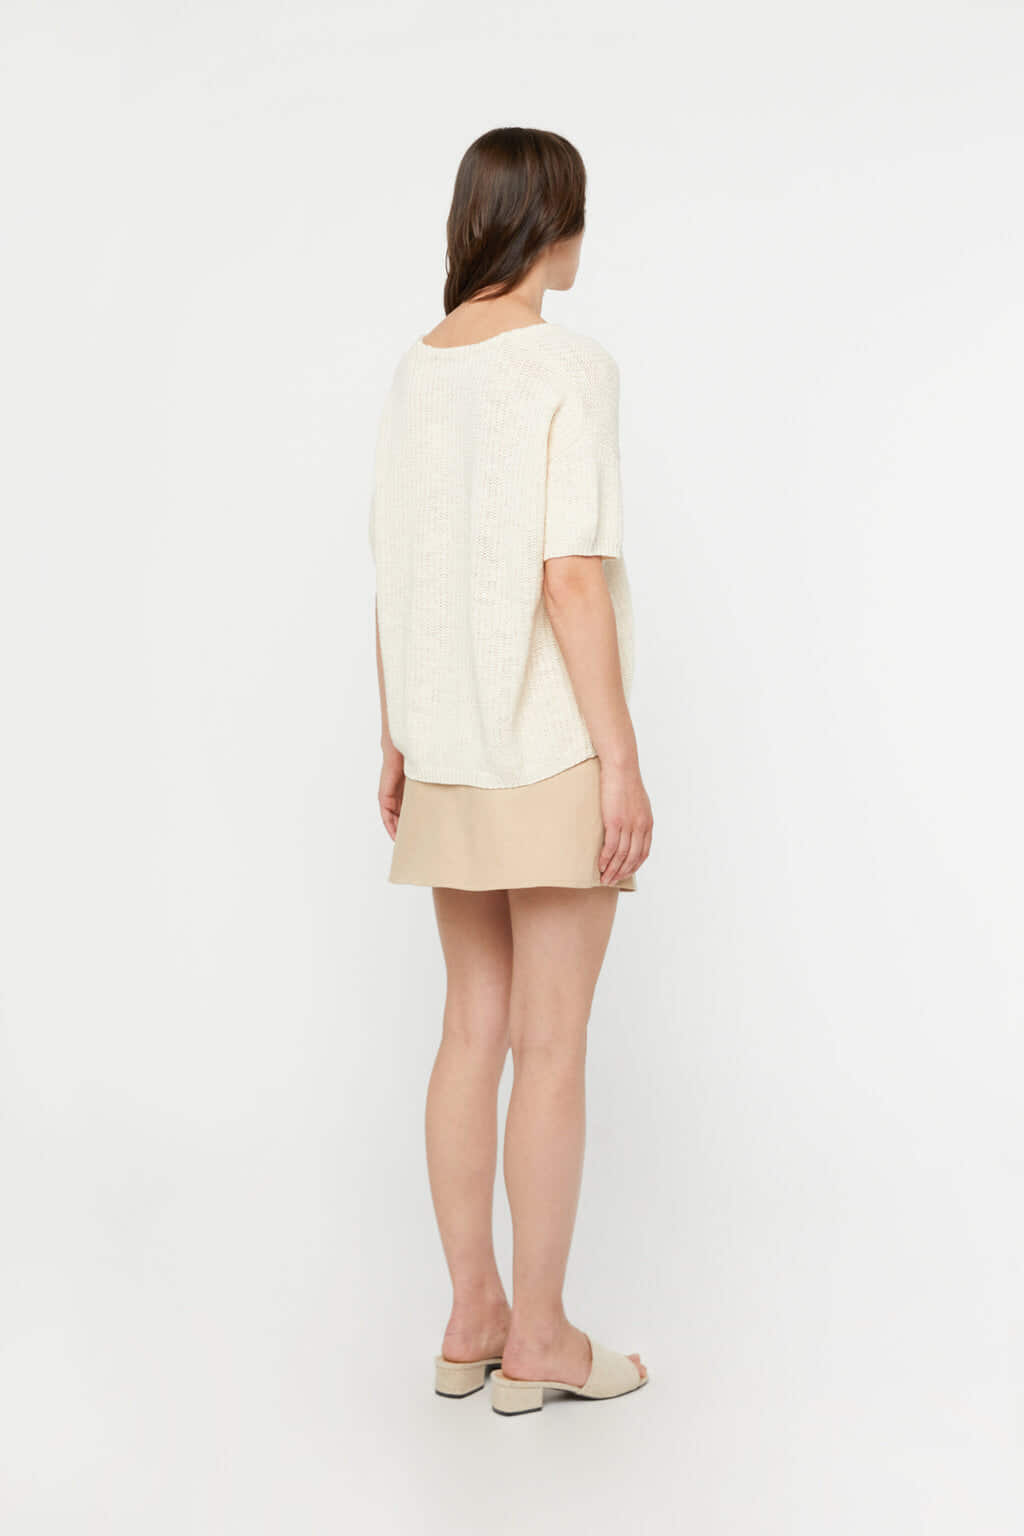 Sweater 3247 Cream 5